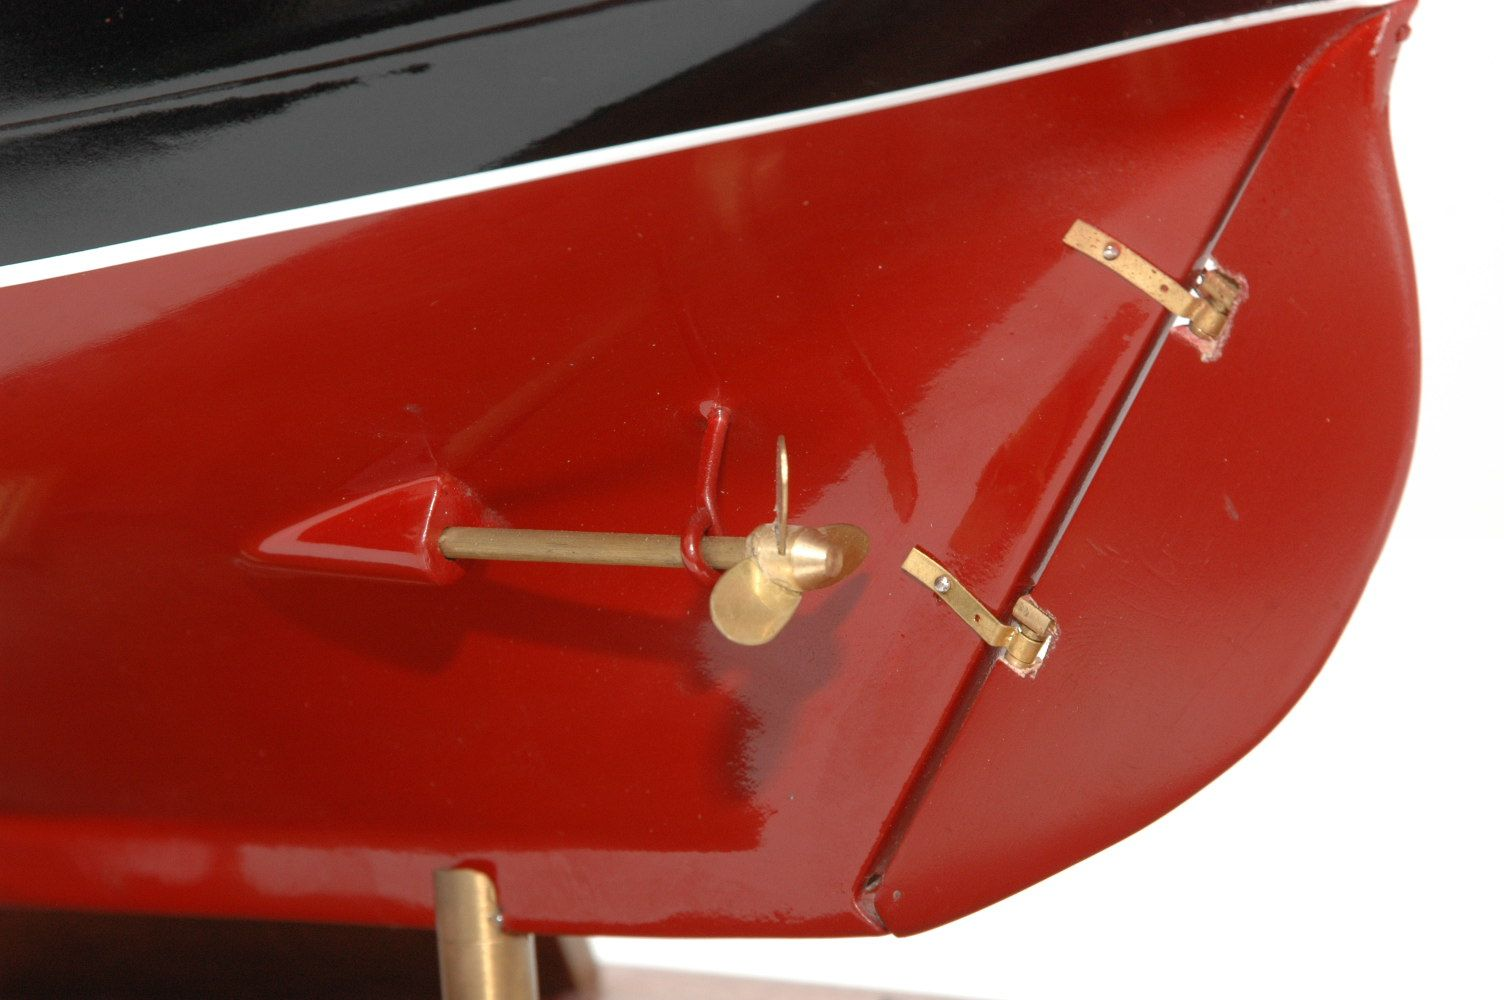 654-6208-Jolie-Brise-Model-Yacht-Premier-Range